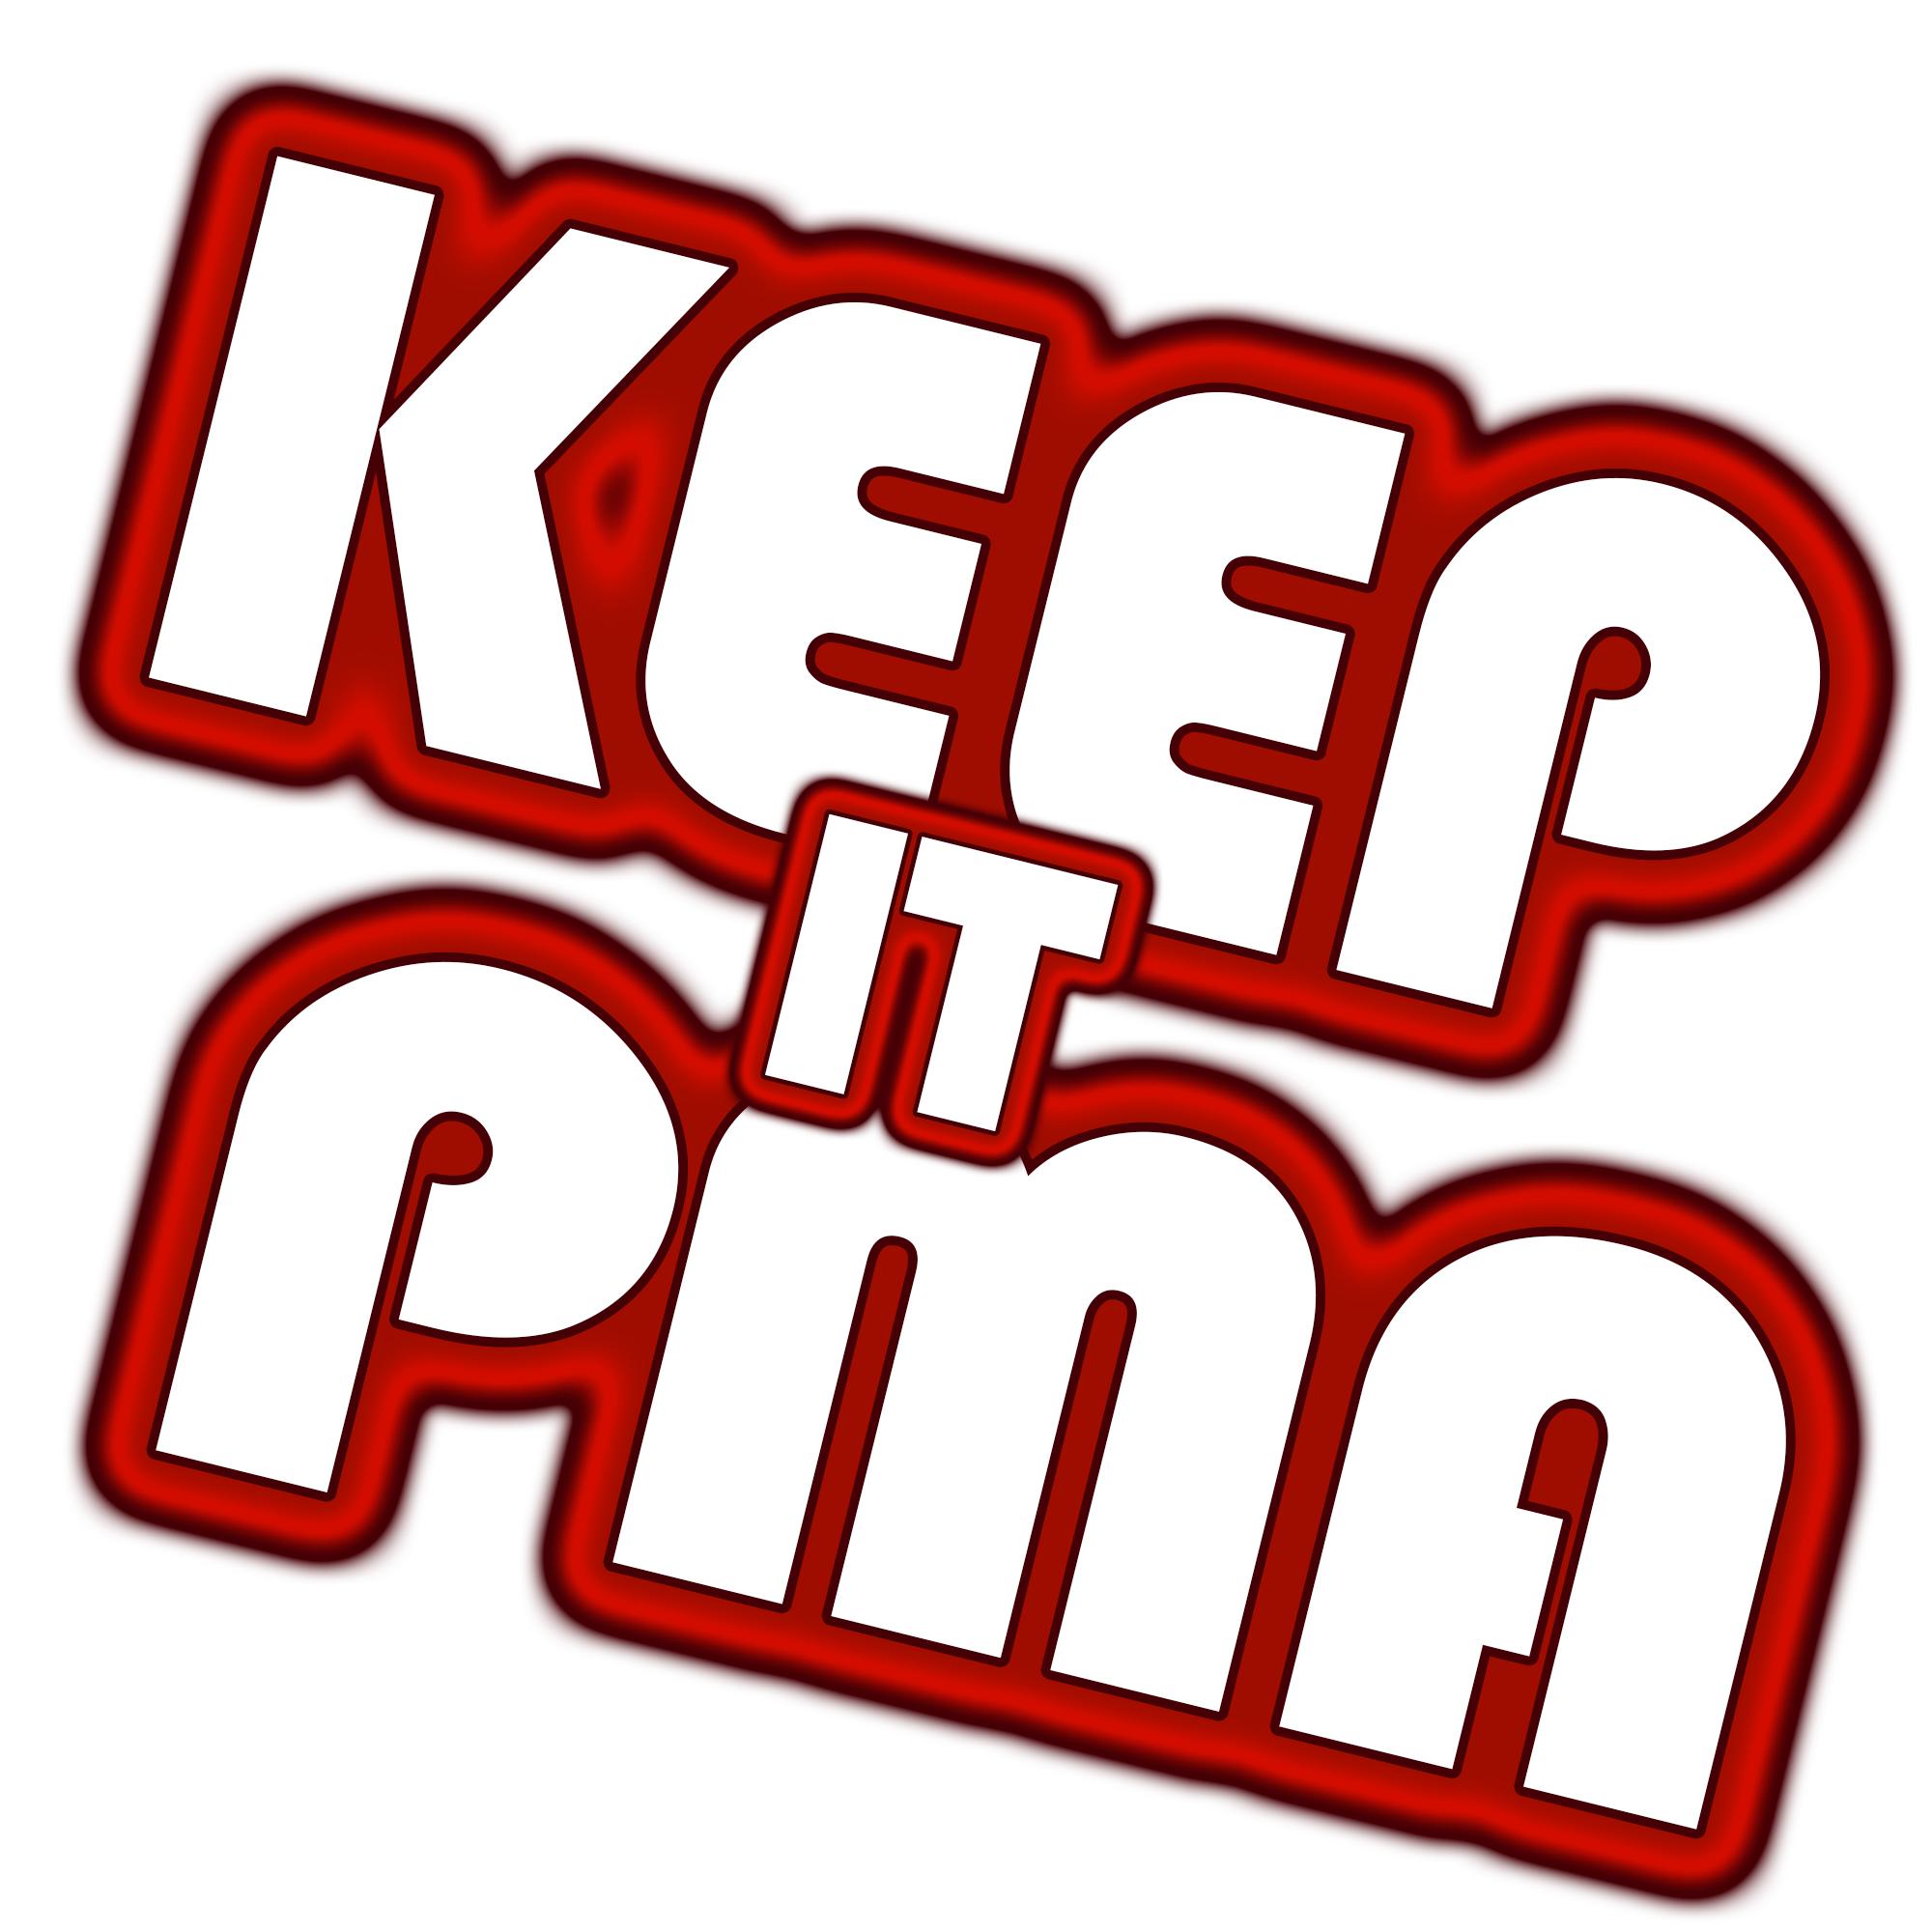 KeepItPMA_2000.png